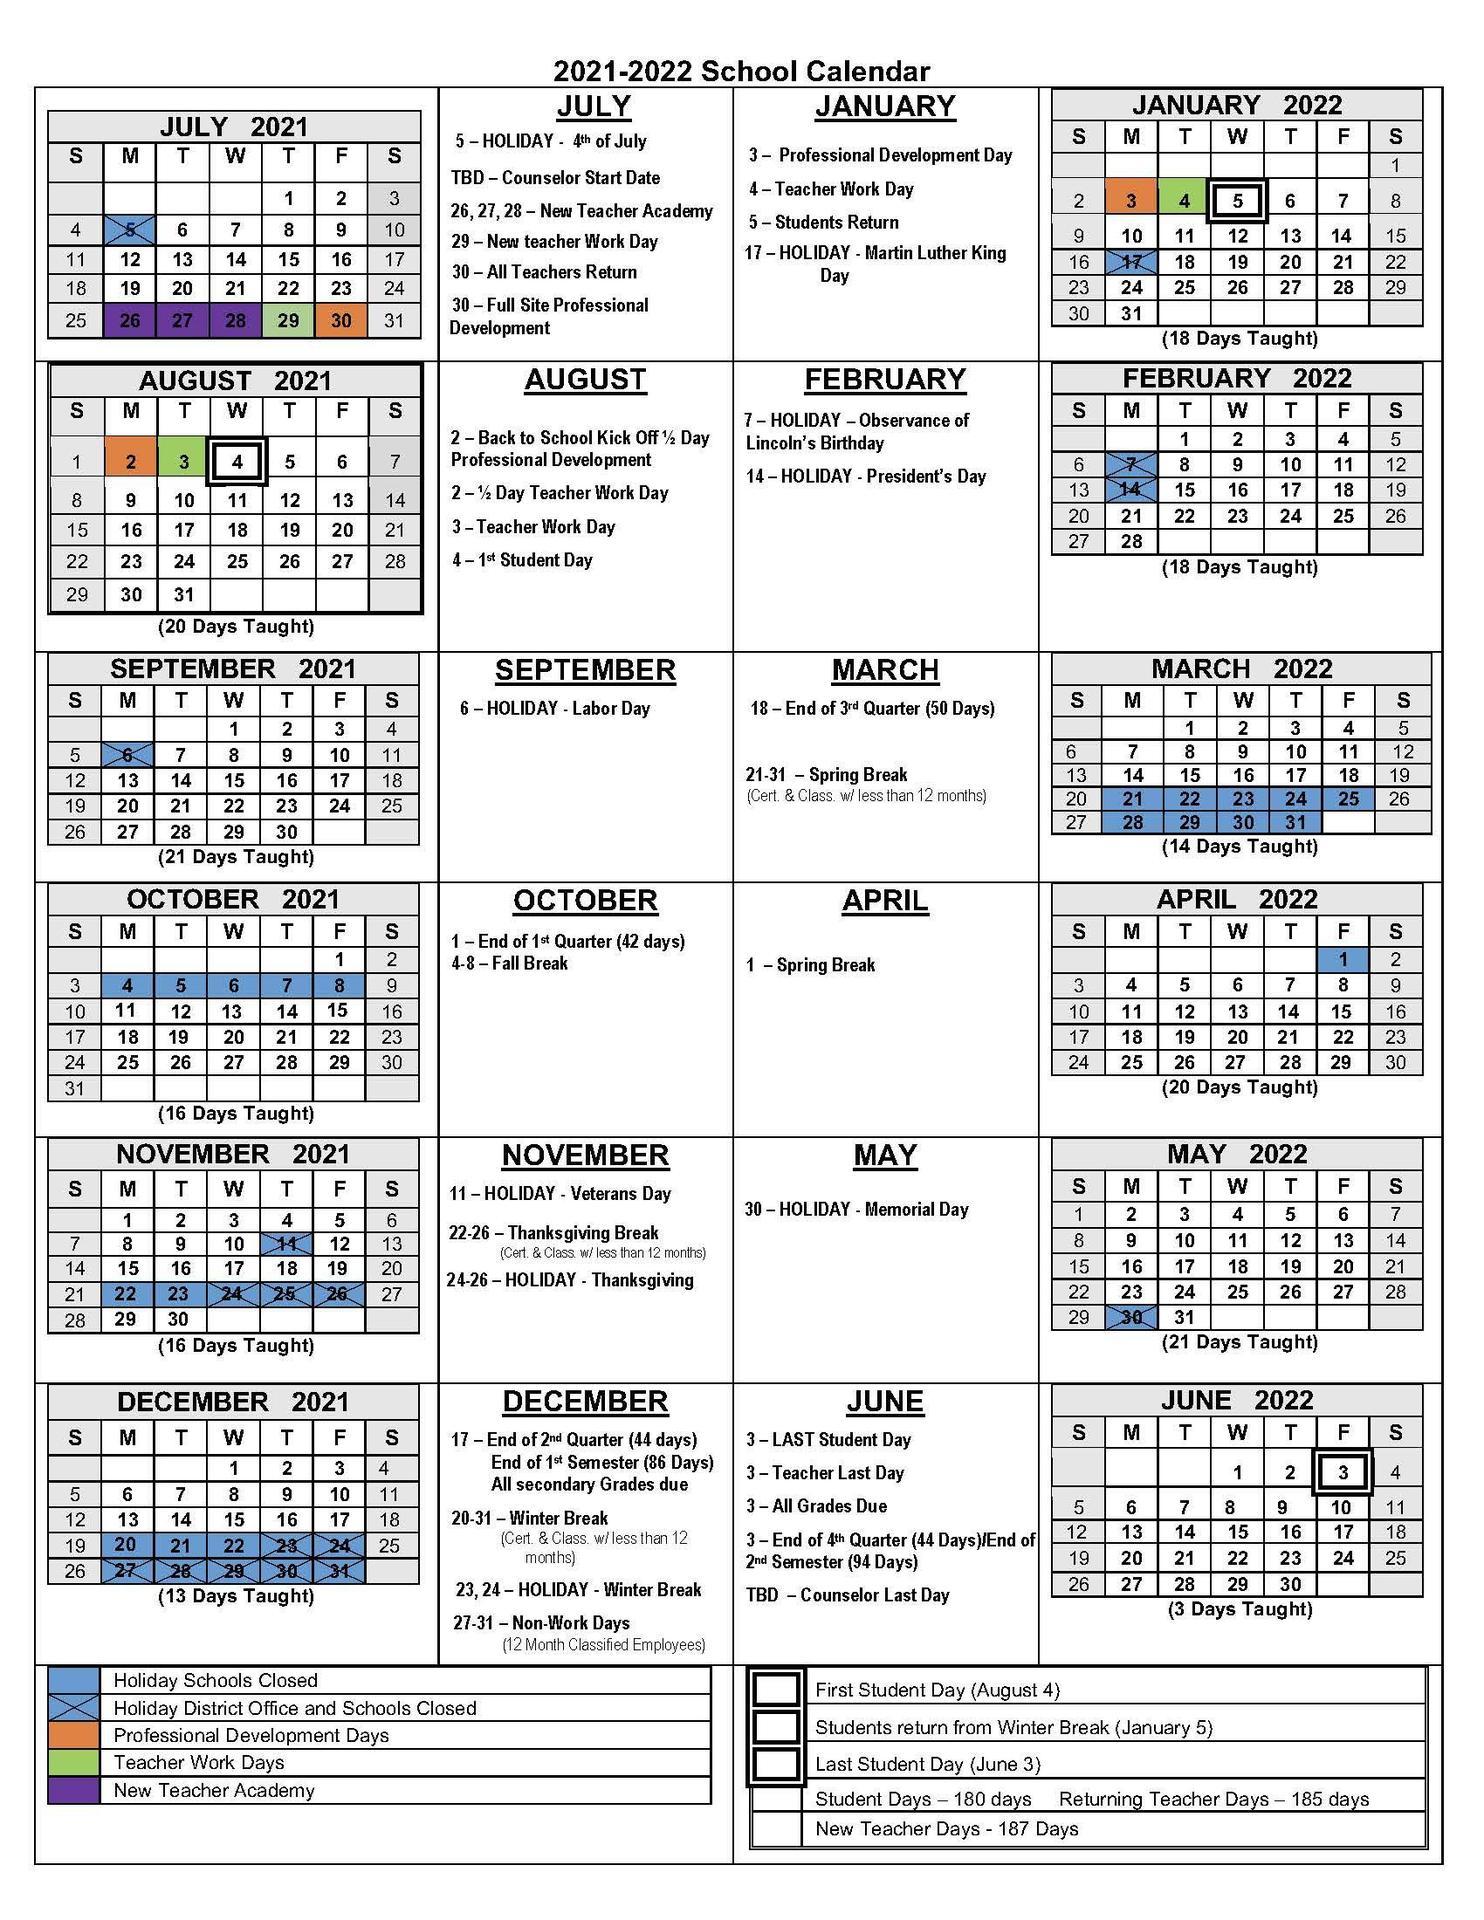 2021 2022 School Calendar Academic Calendars Monterey Peninsula Unified School District